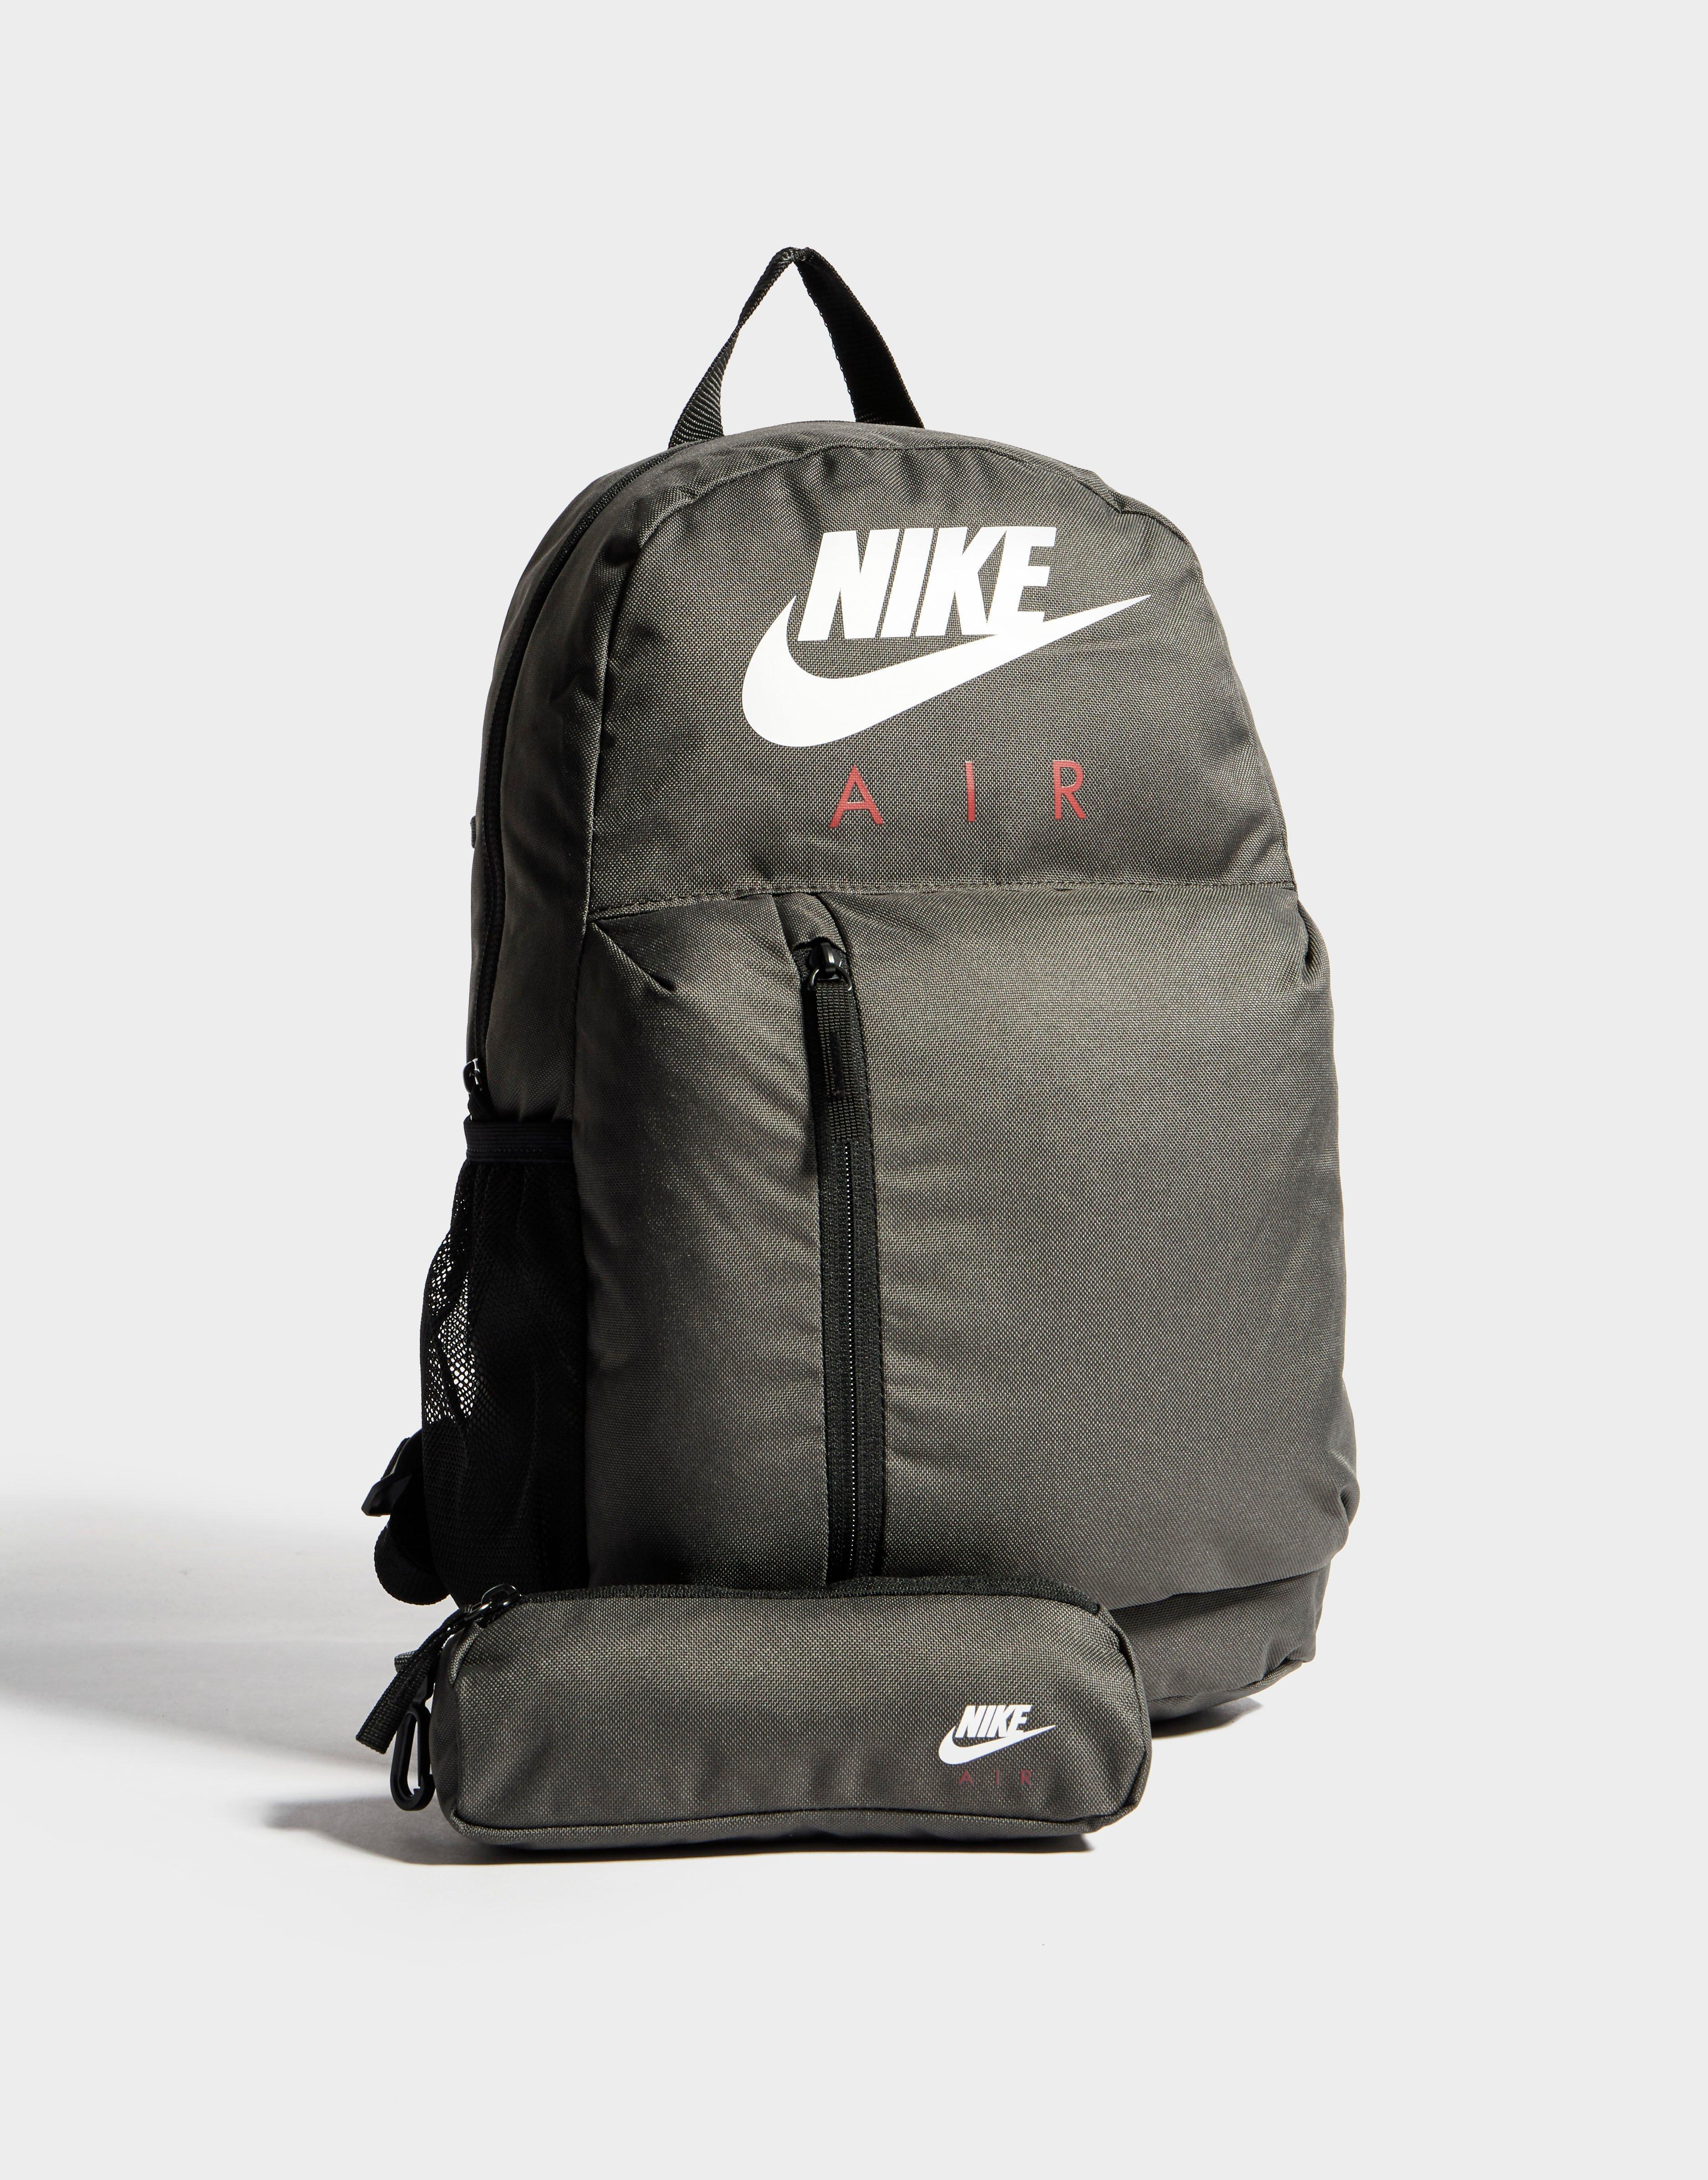 72bacc01ed85 Nike Elemental Backpack in Black for Men - Lyst